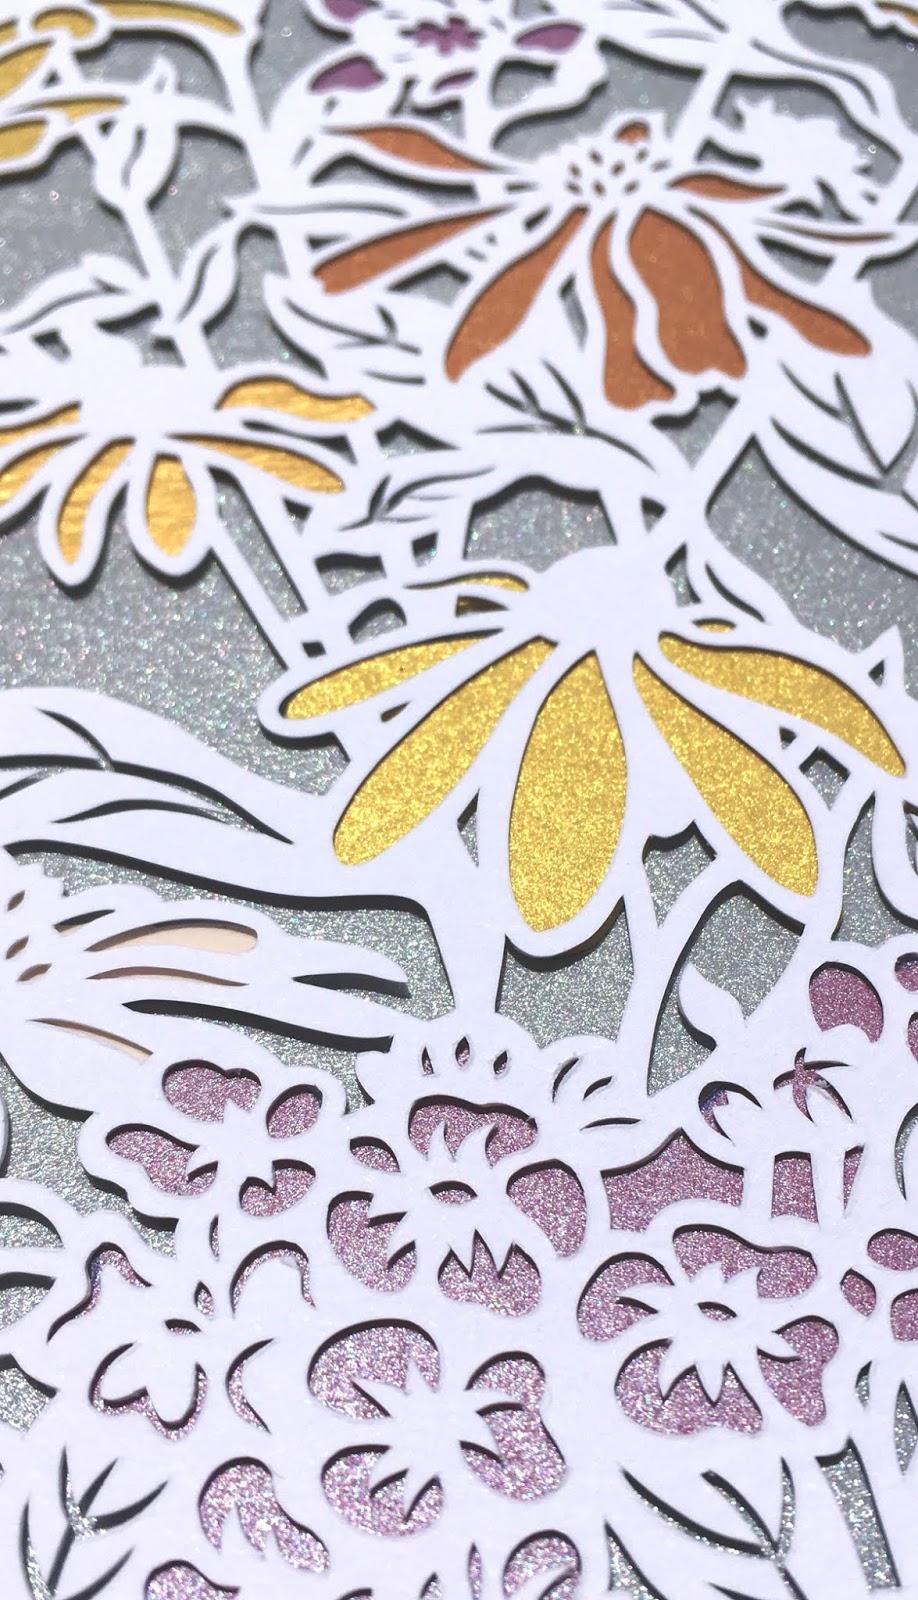 handmade papercut art for wedding by Naomi Shiek